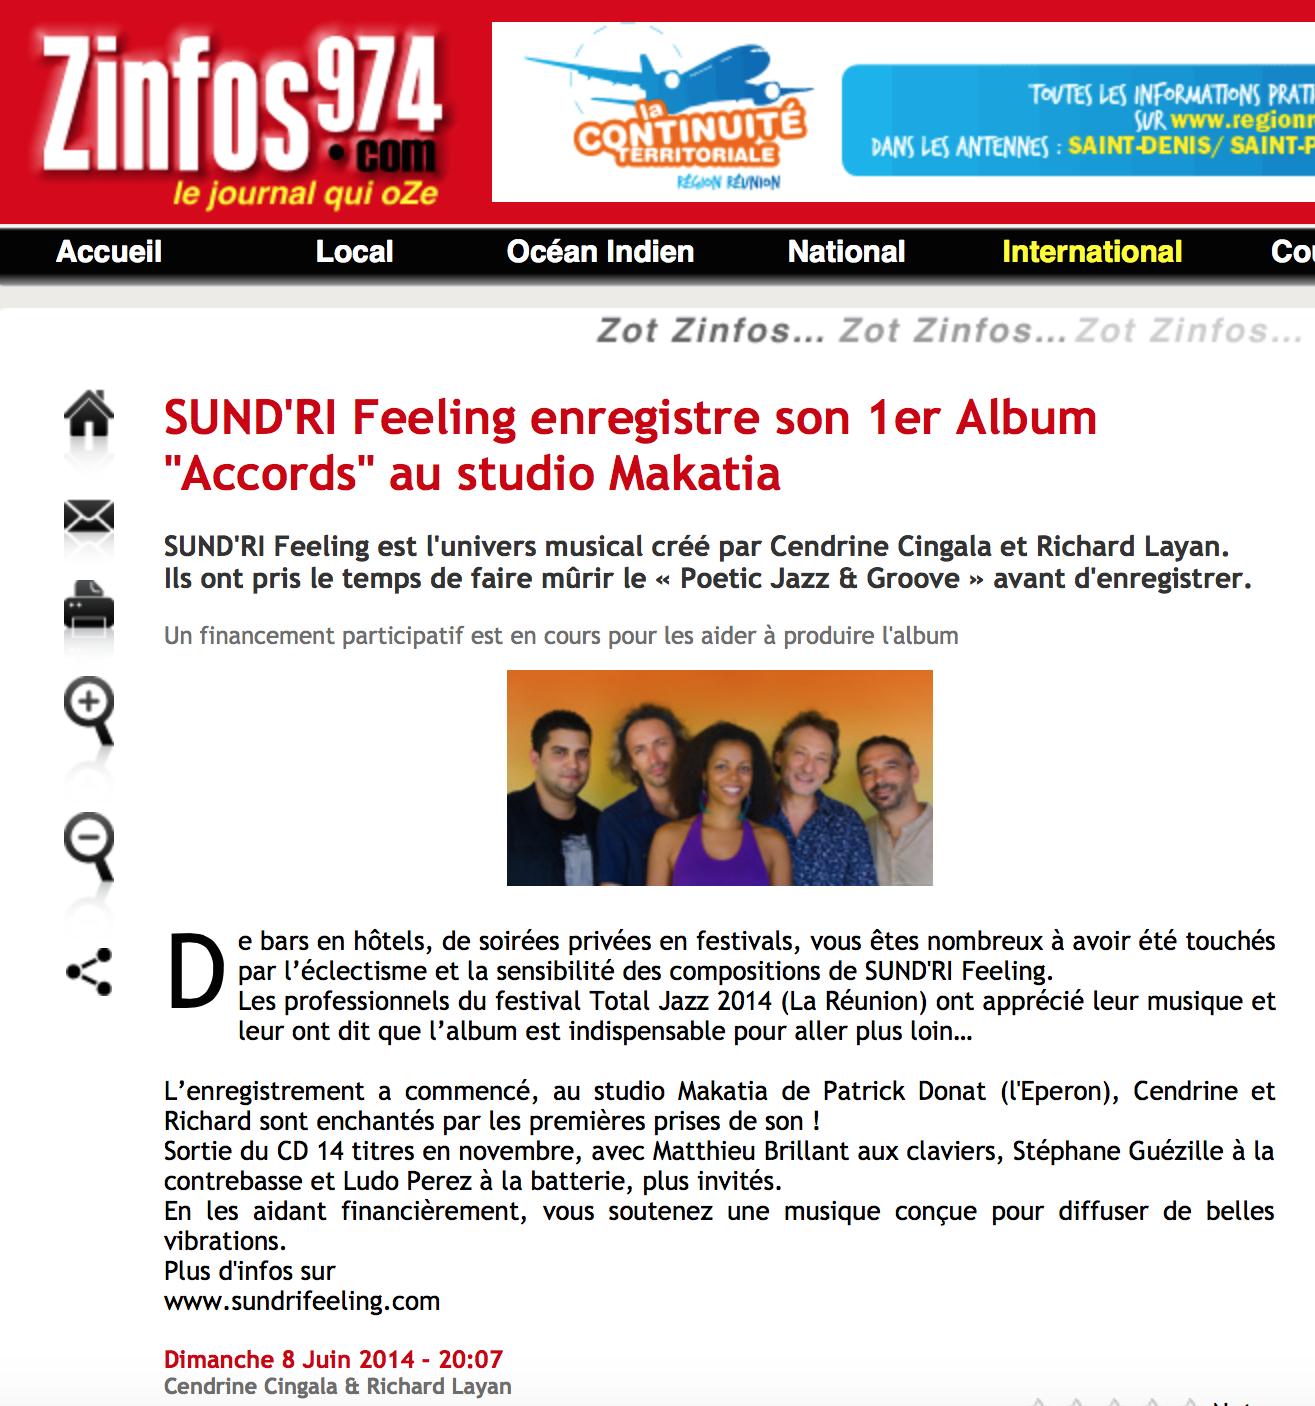 SundRi_Feeling_Zinfos974_Juin2014.png